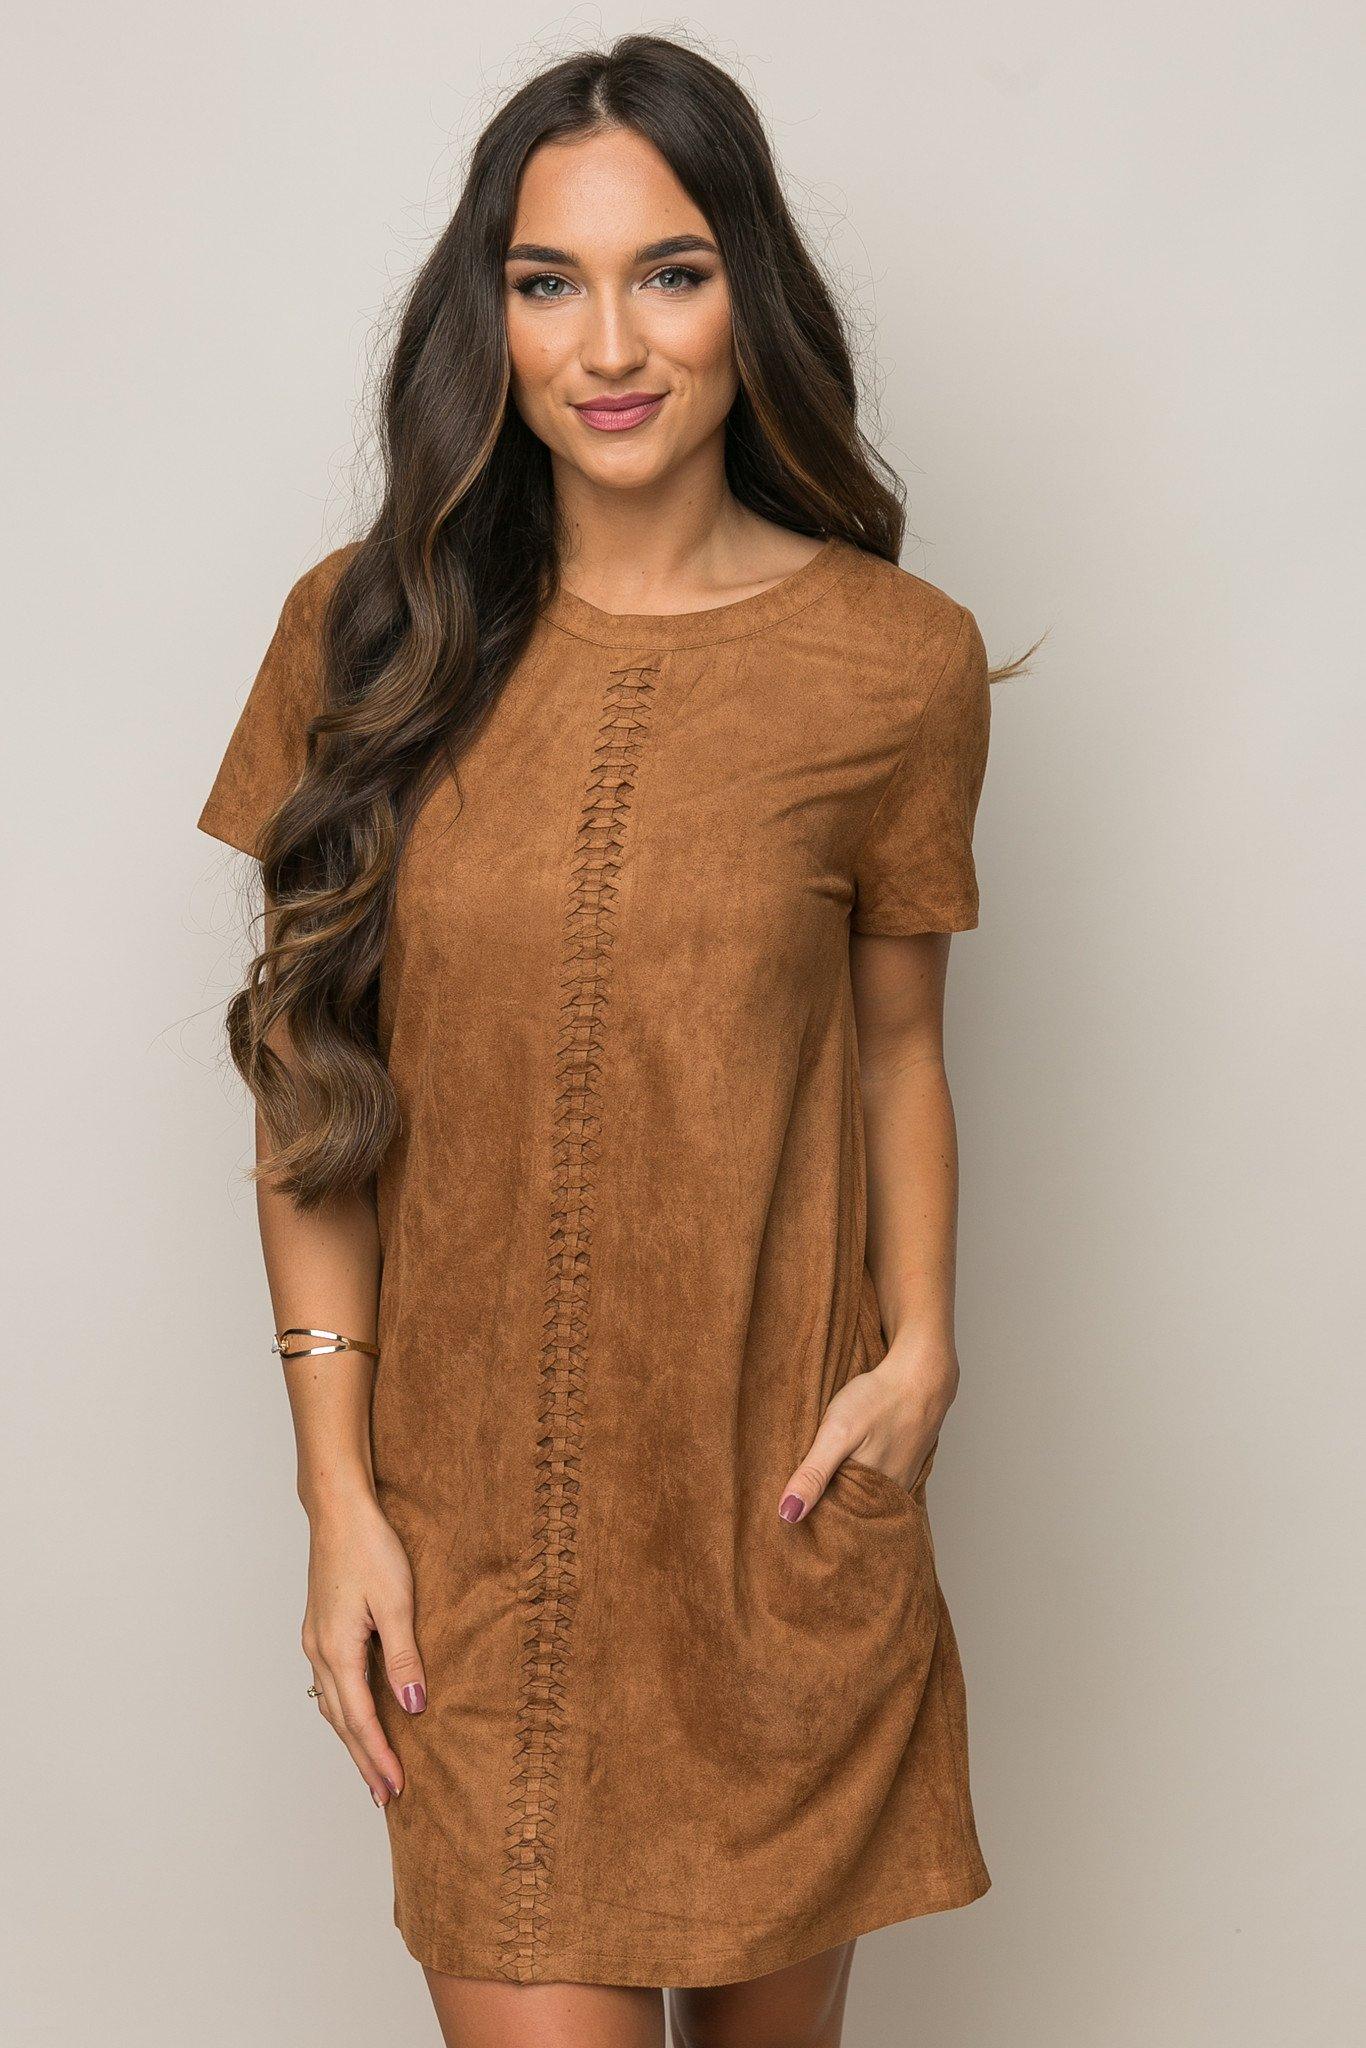 tan_camel_suede_shortsleeve_shift_dress-3_2048x2048.jpg